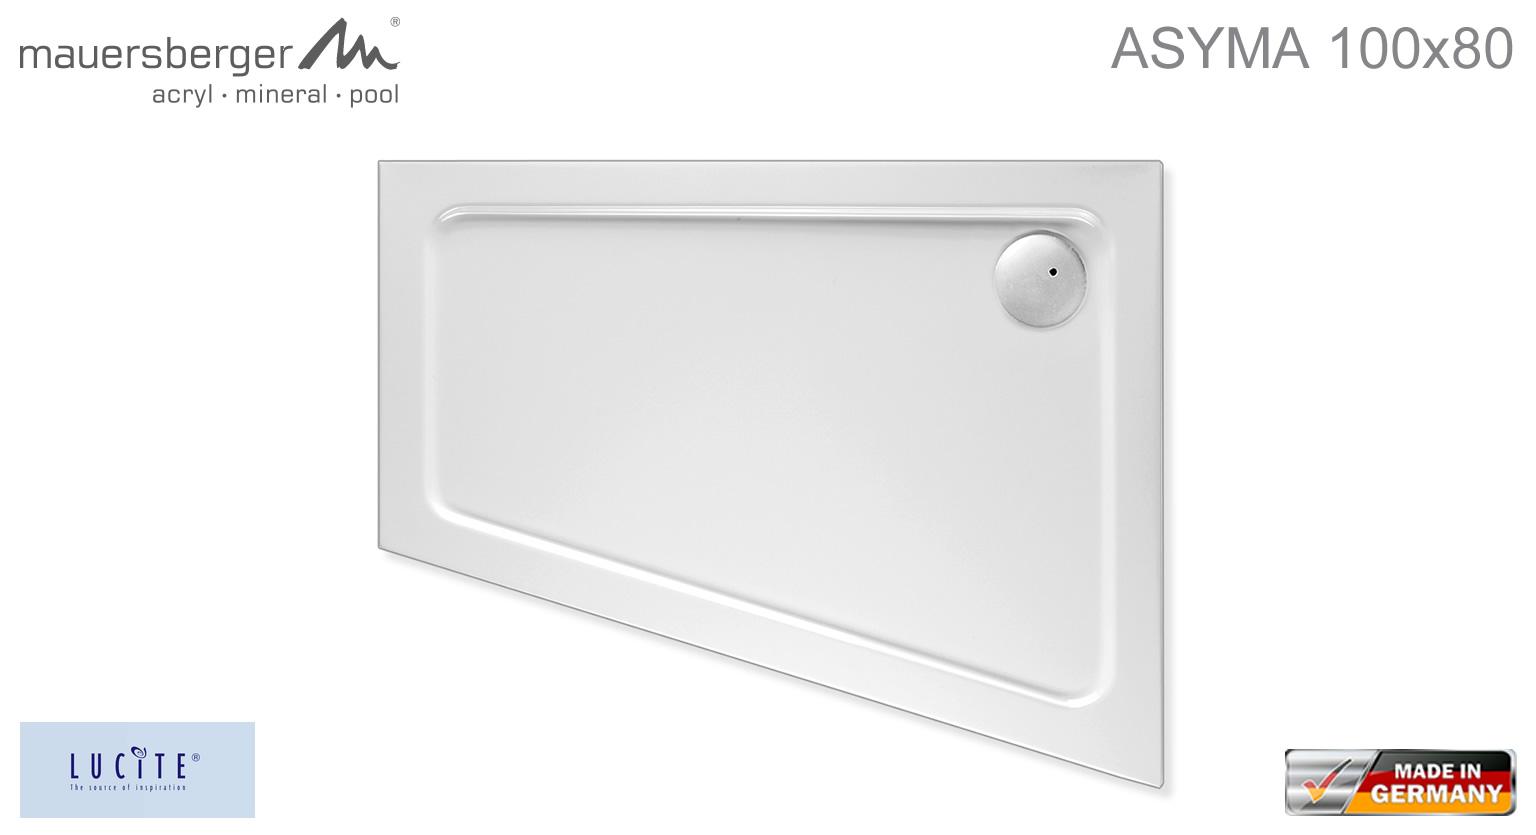 mauersberger duschwanne asyma 100 x 80 cm superflach links impulsbad. Black Bedroom Furniture Sets. Home Design Ideas